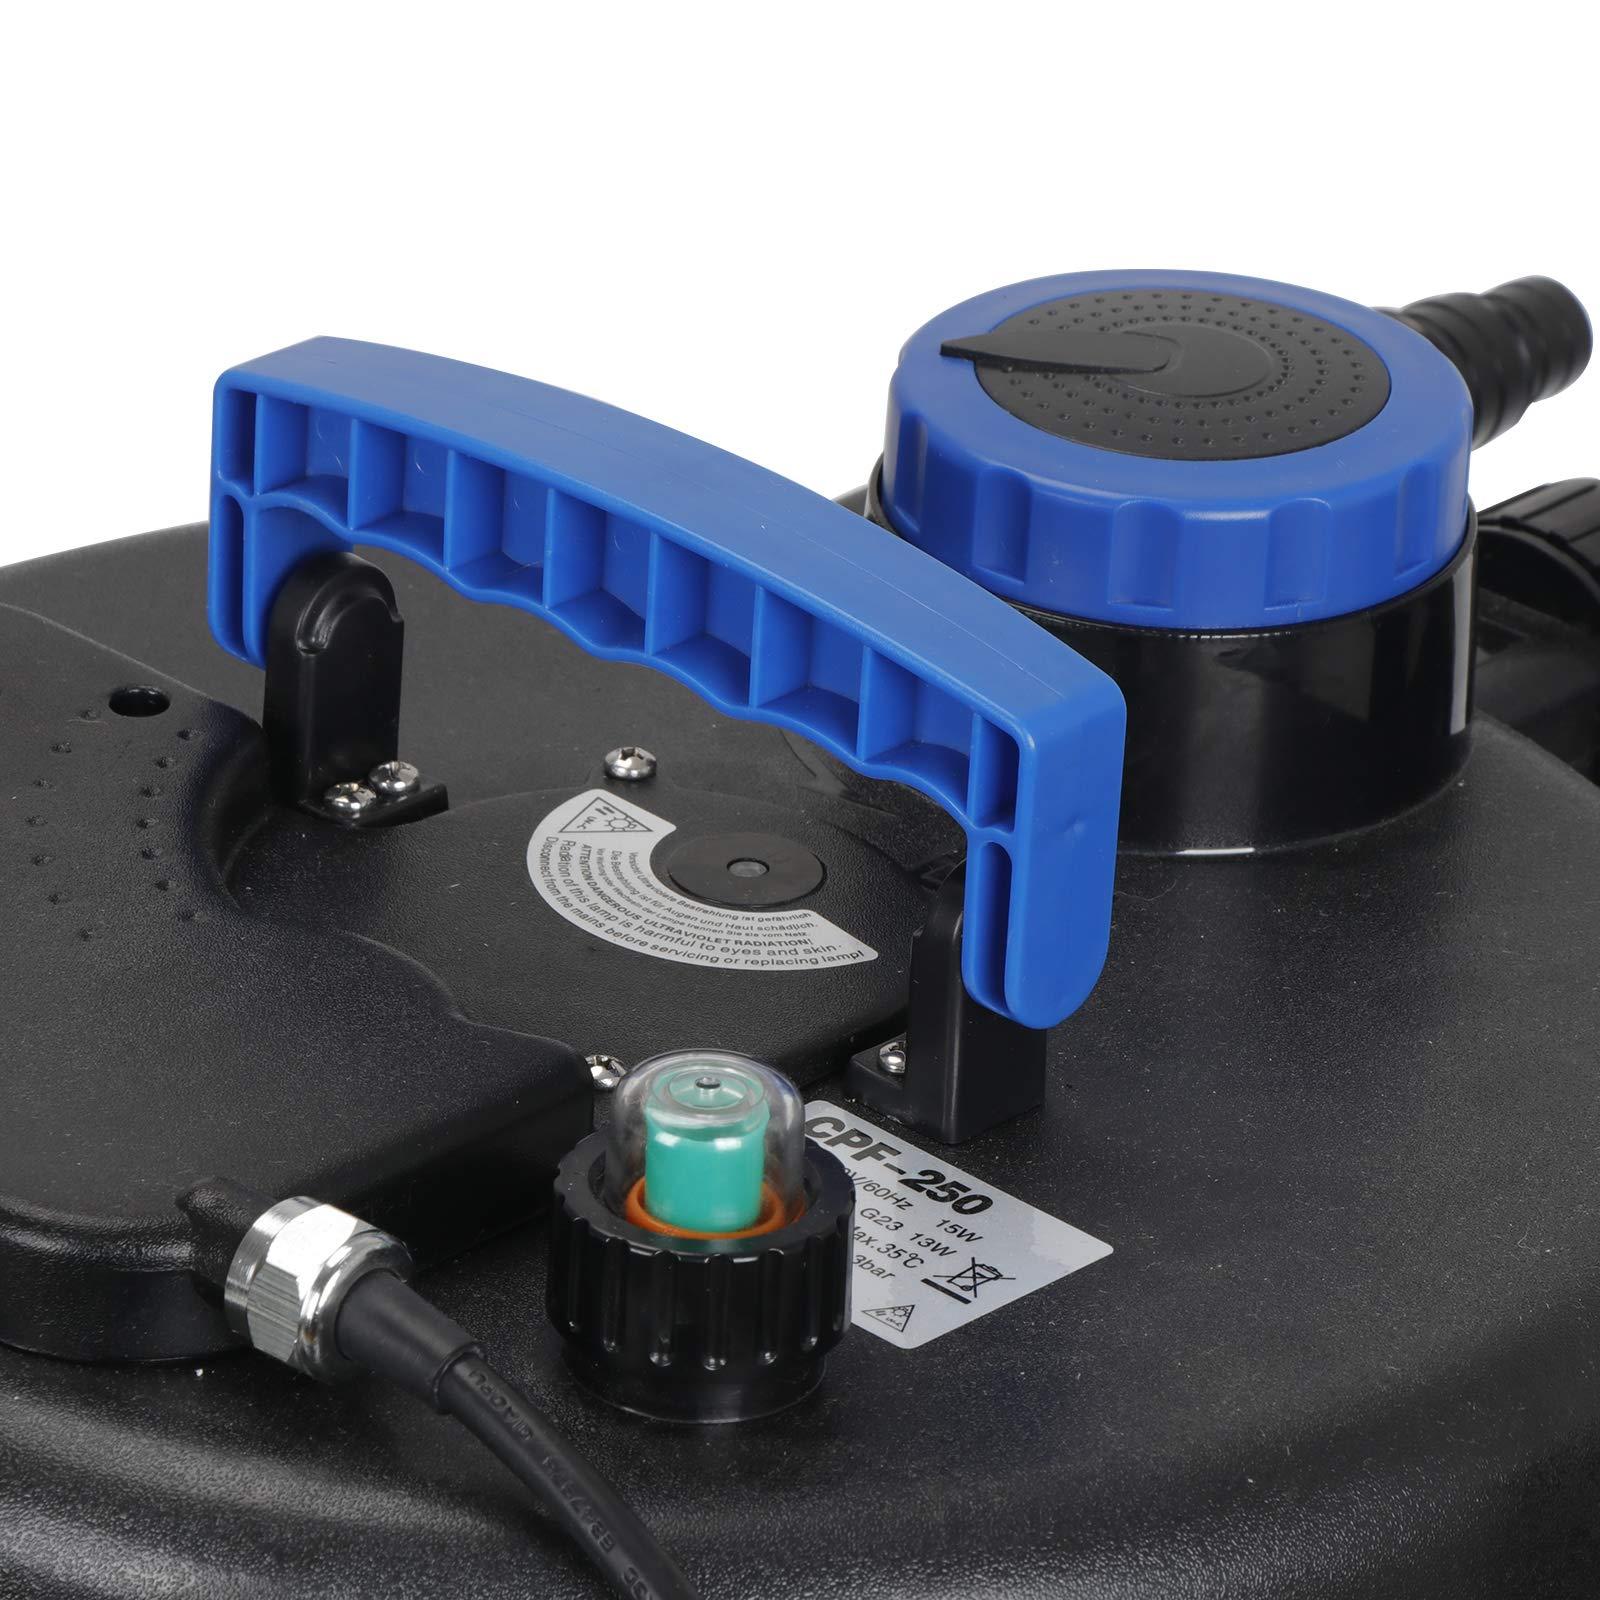 10000L Pond Pressure Bio Filter UV Sterilizer Water PurifierClarifier Koi Fish Ponds Skimmer With Ultraviolet Light& Flow Indicator for Aquarium,Algae Control by ZENSTYLE (Image #3)